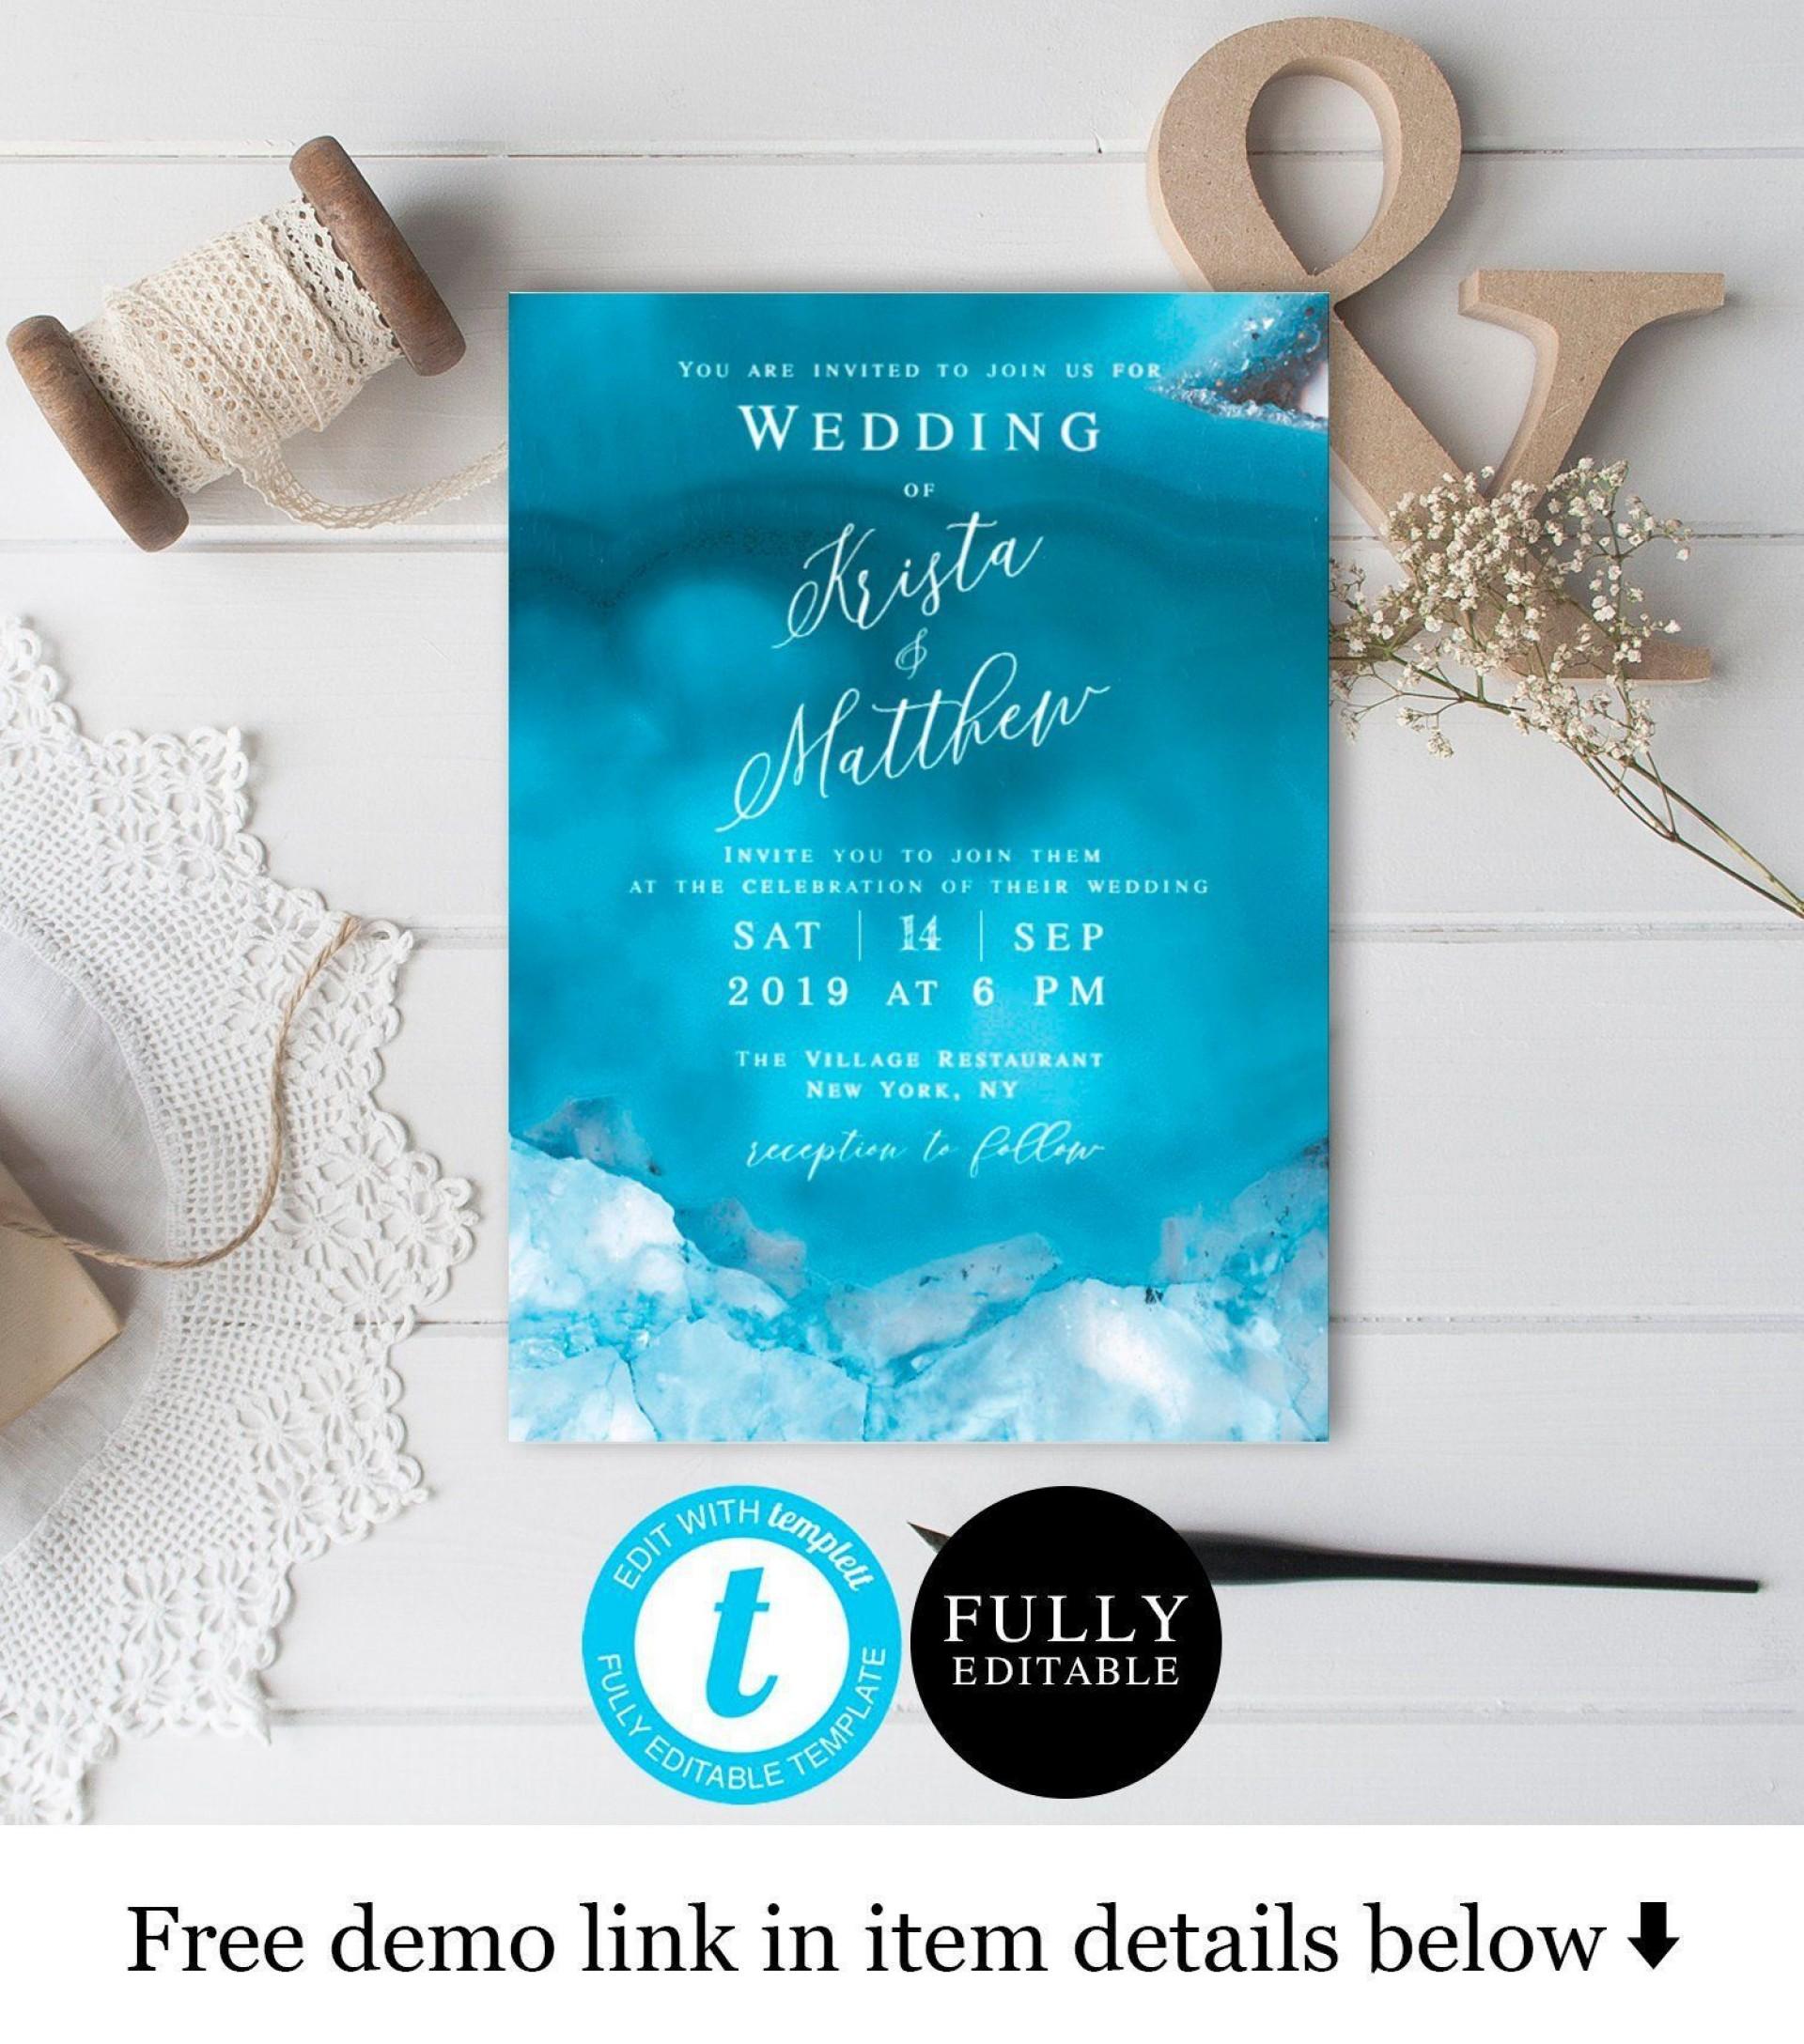 005 Singular Beach Wedding Invitation Template Photo  Templates Free Download For Word1920